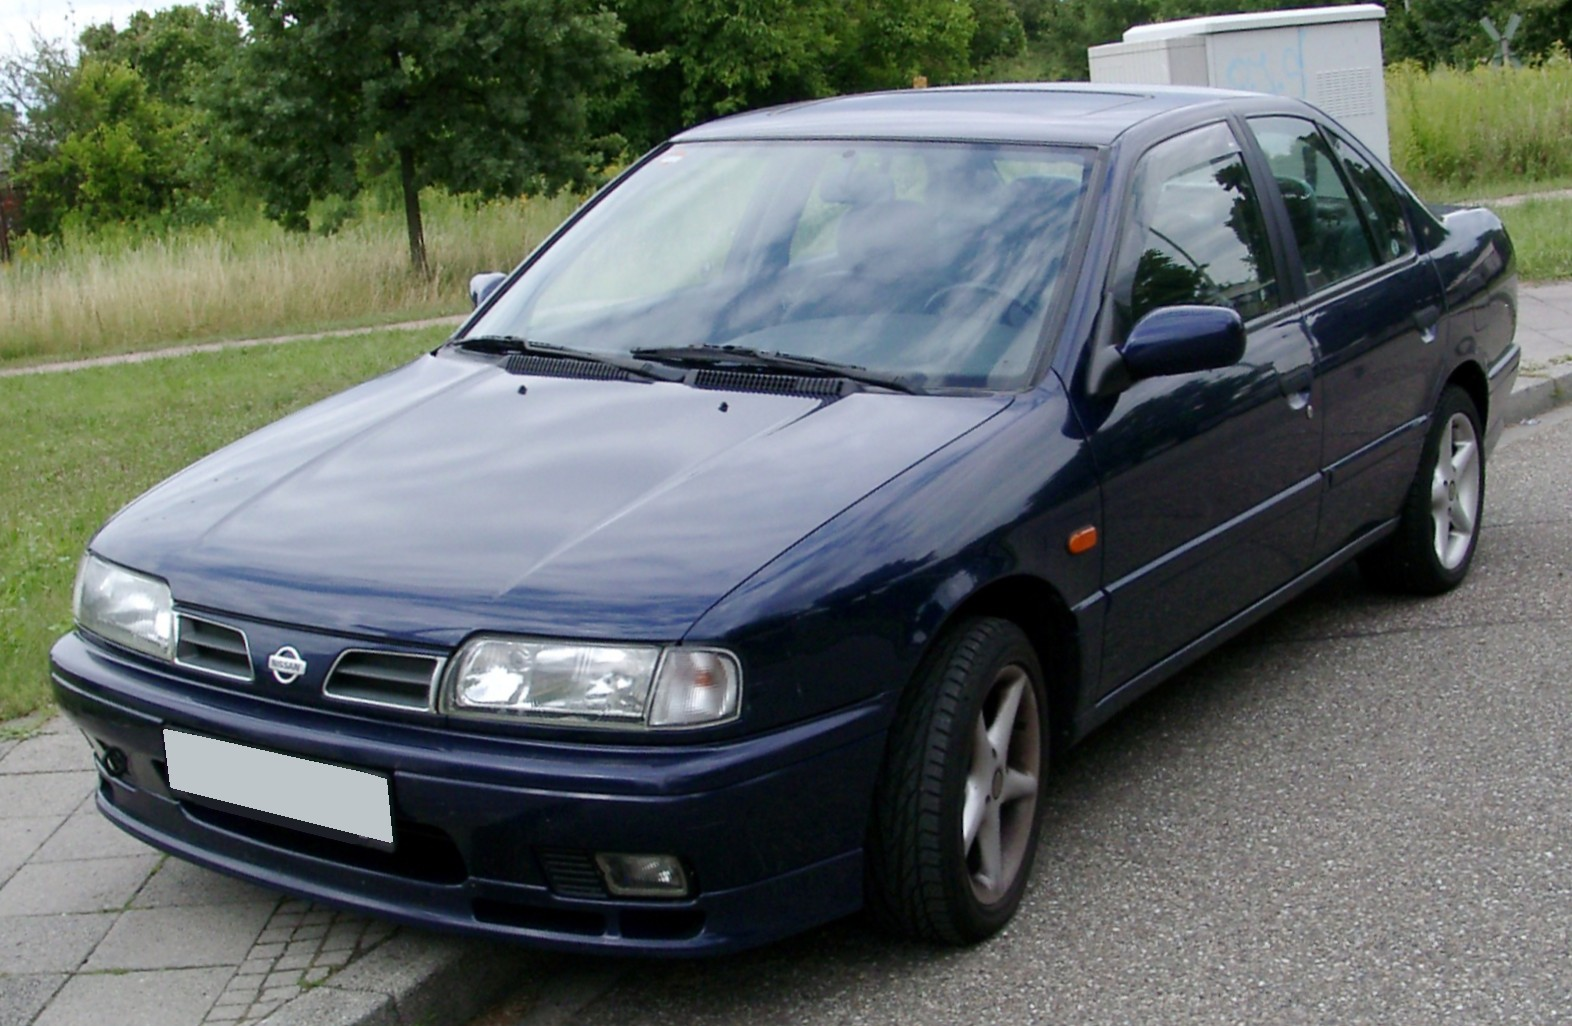 Nissan Primera I (P10) 1990 - 1996 Sedan #5